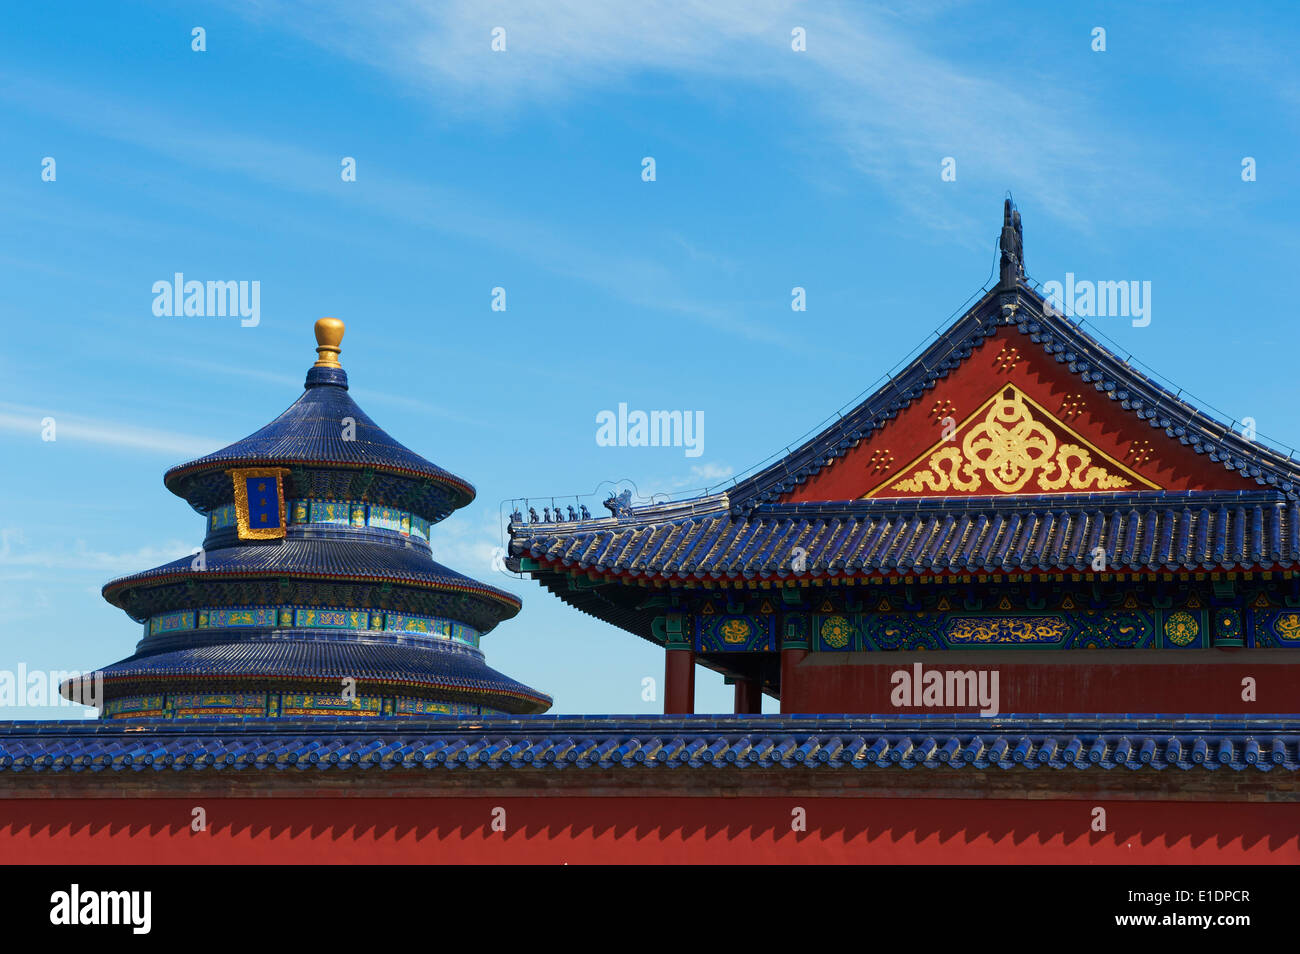 La Chine, Pékin, Temple du Ciel, Unesco world heritage Photo Stock